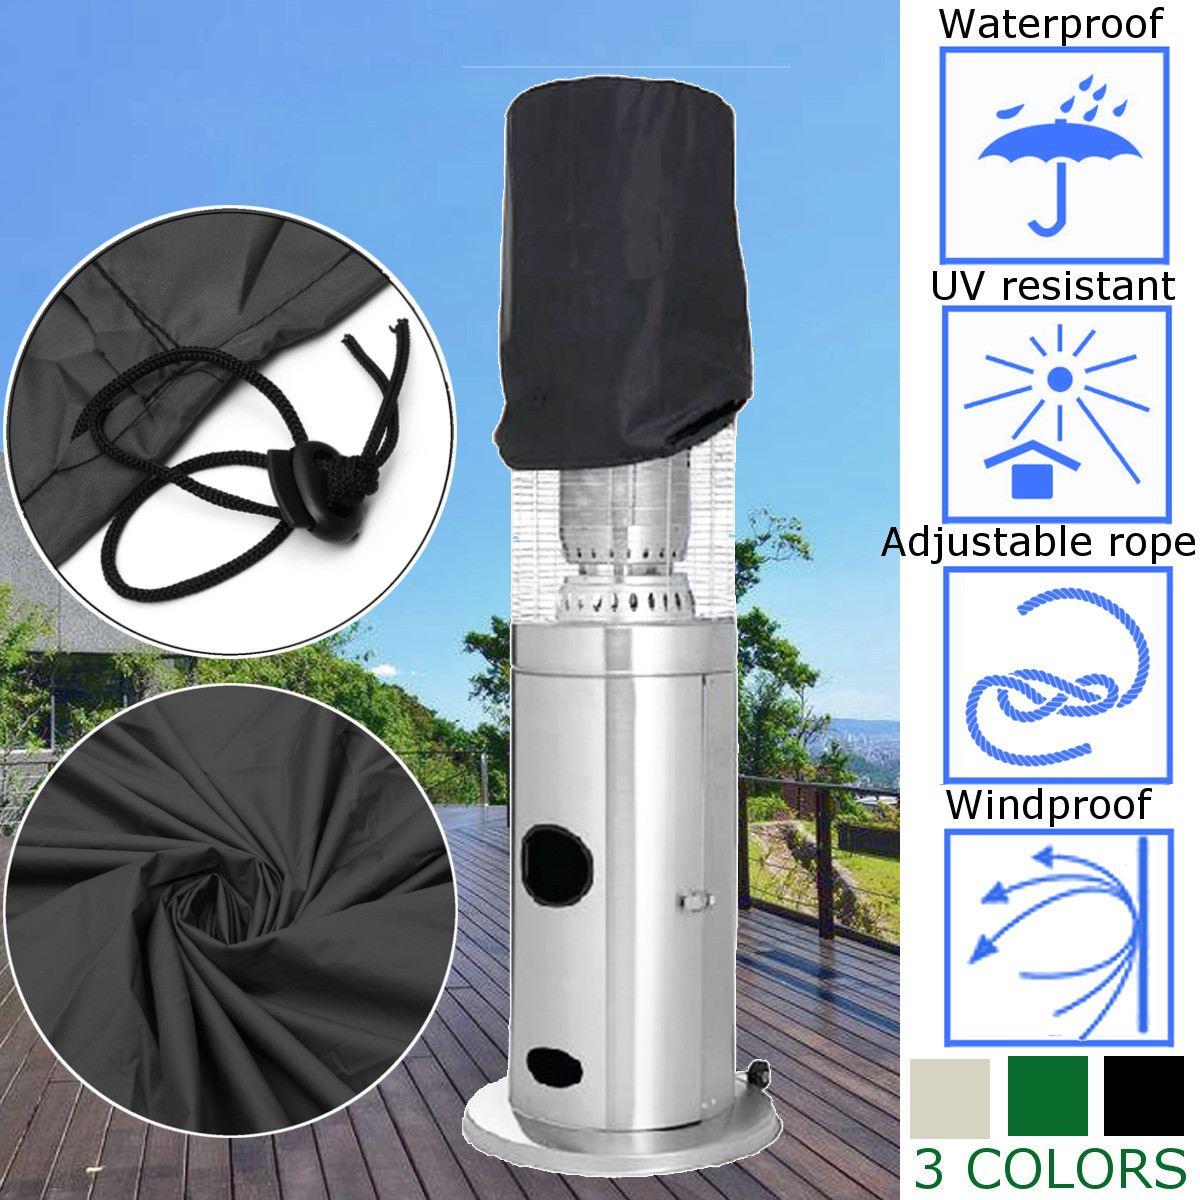 50*45*45cm 3 ColorOutdoor Rain Waterproof Heater Cover Protector Backyard Garden Patio Heater Dust All-Purpose Cover